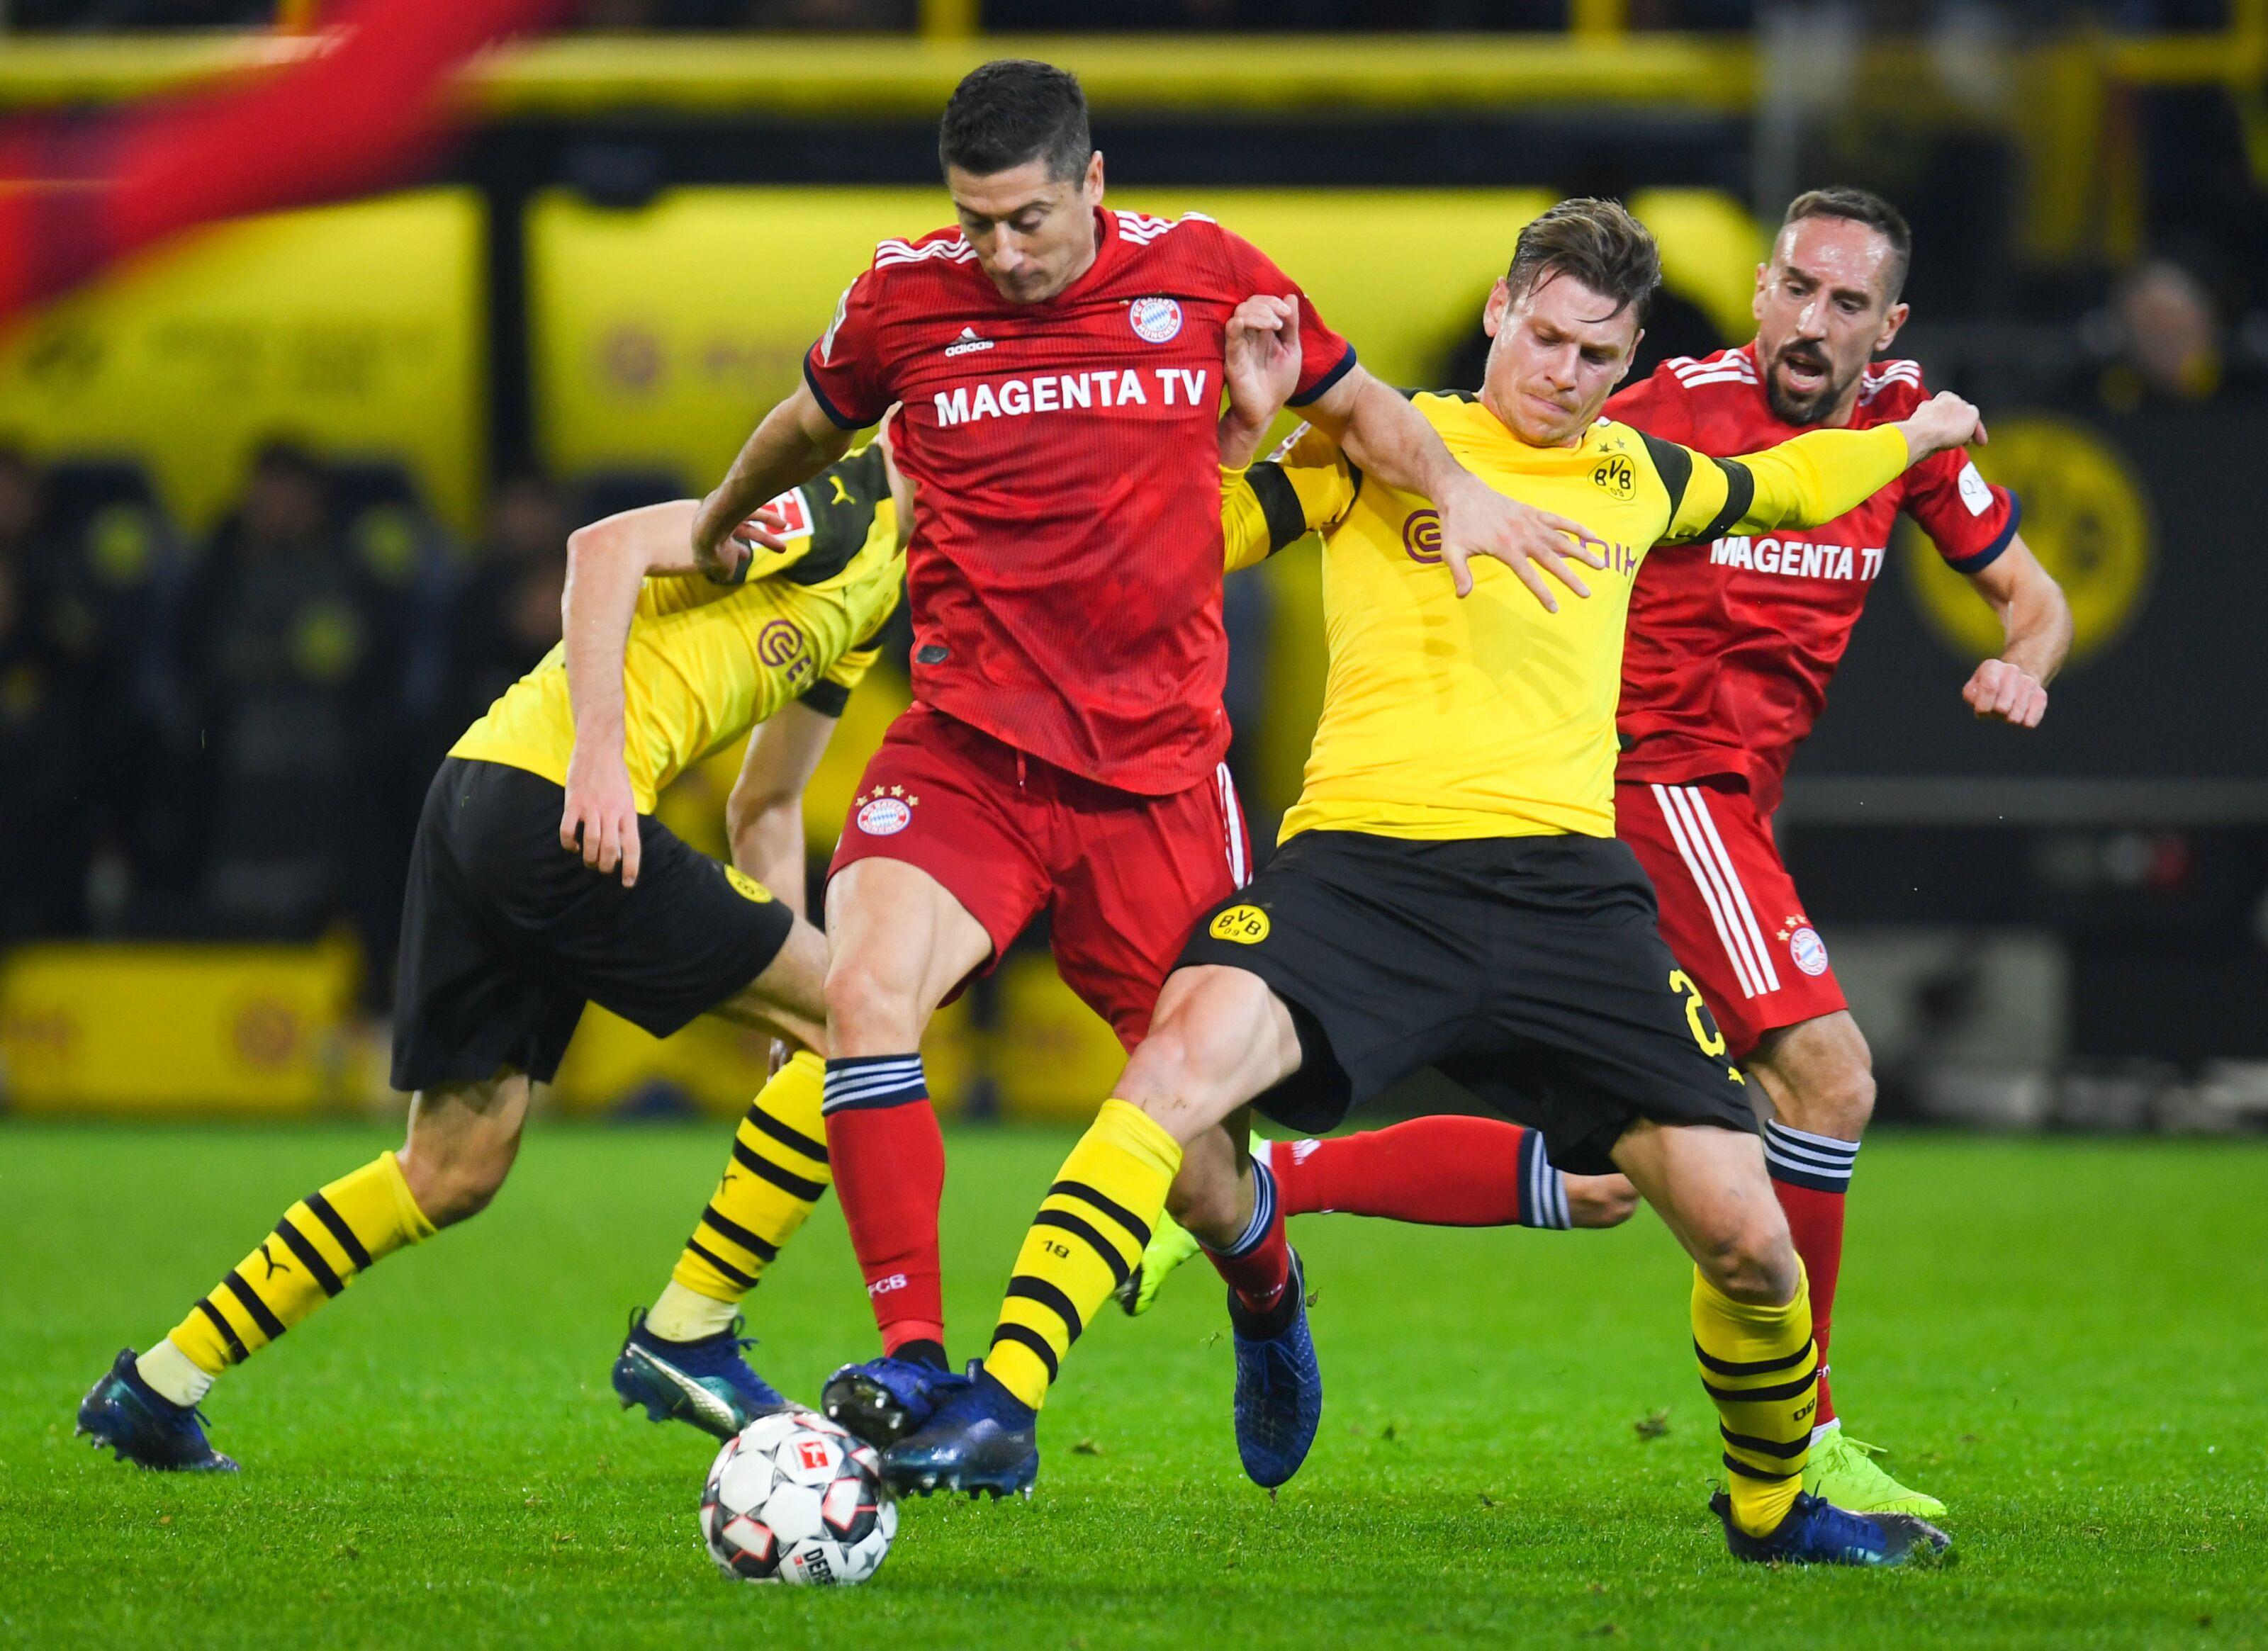 Bayern Munichs Polish Forward Robert Lewandowski And Dortmunds Polish Defender Lukasz Piszczek Vie For The Ball During The German First Division